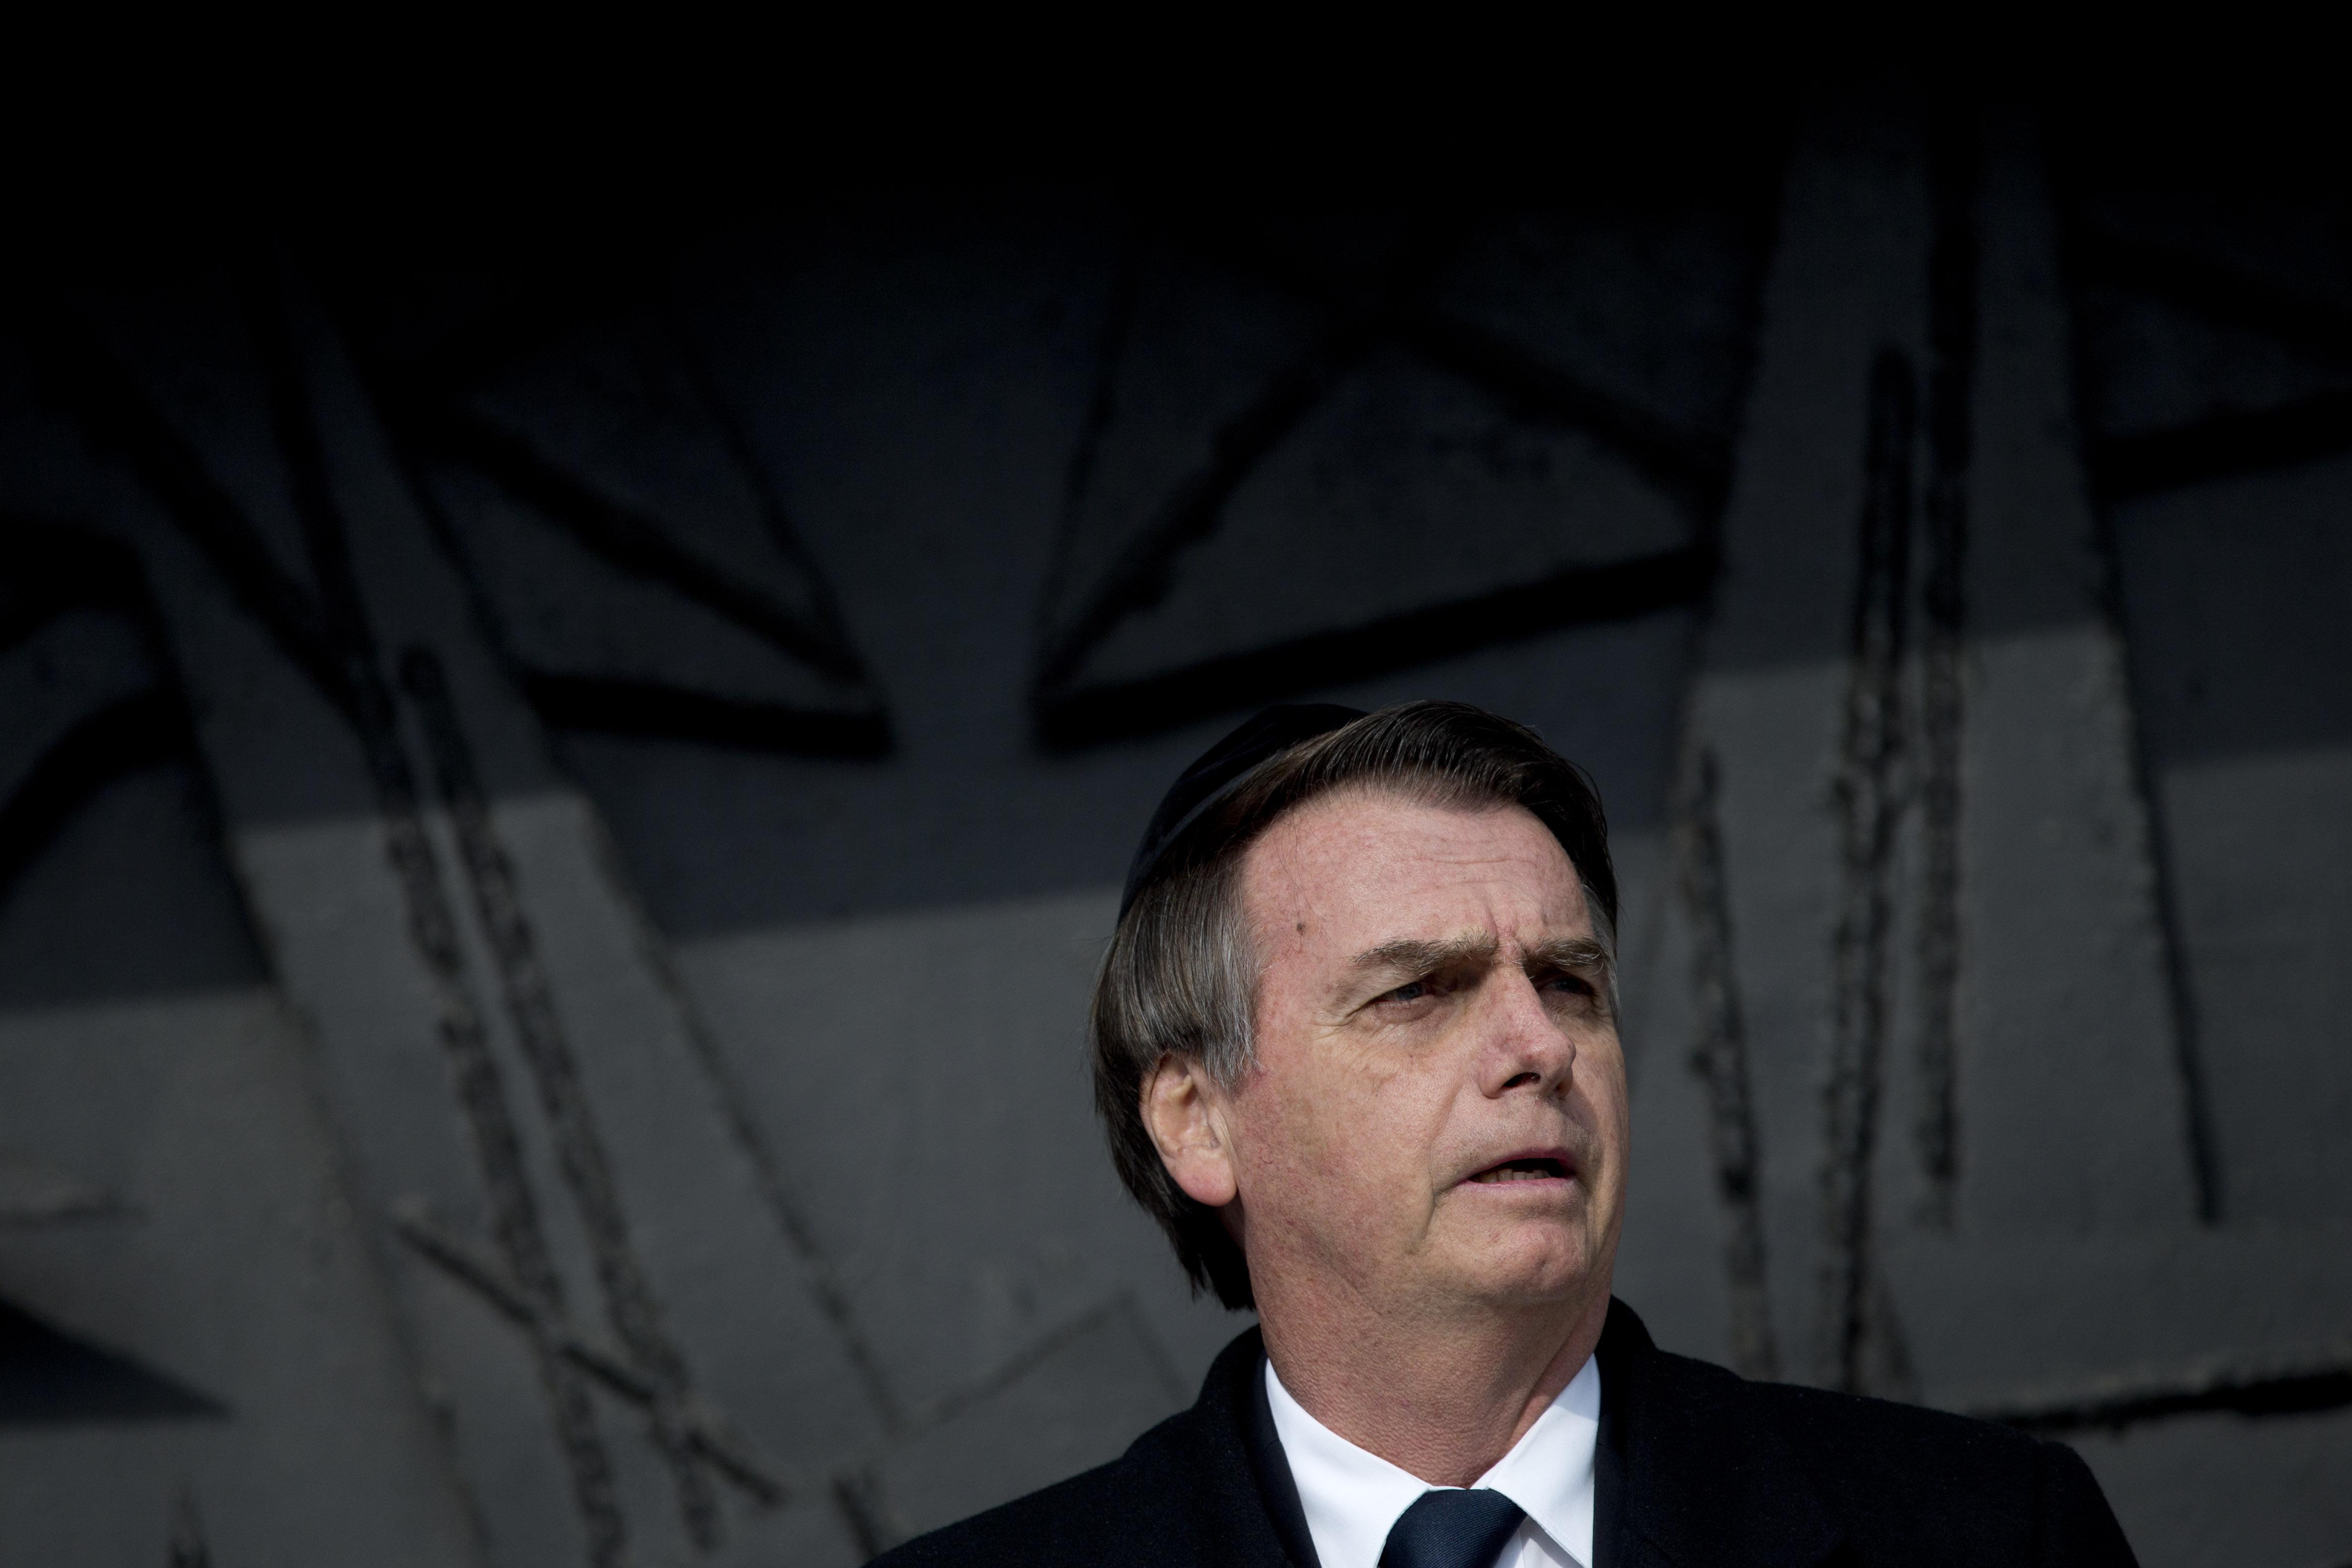 En visite en Israël, Bolsonaro affirme que le nazisme est de